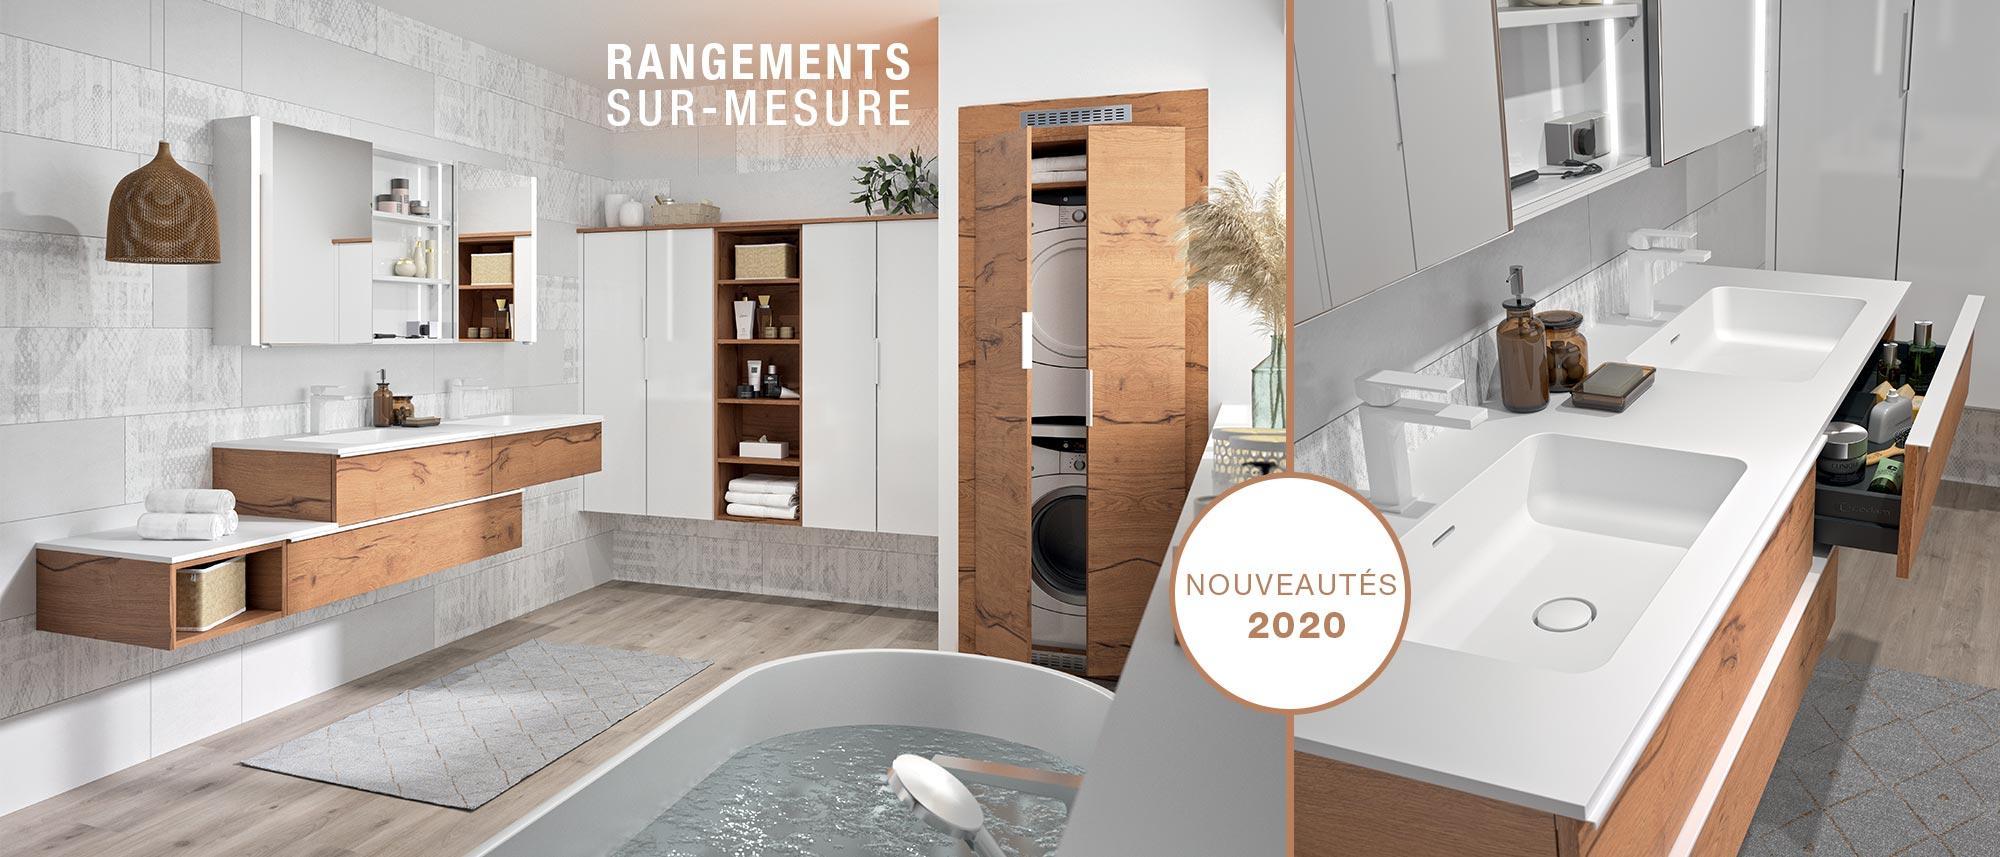 Trend Salle De Bain Aubade Rennes